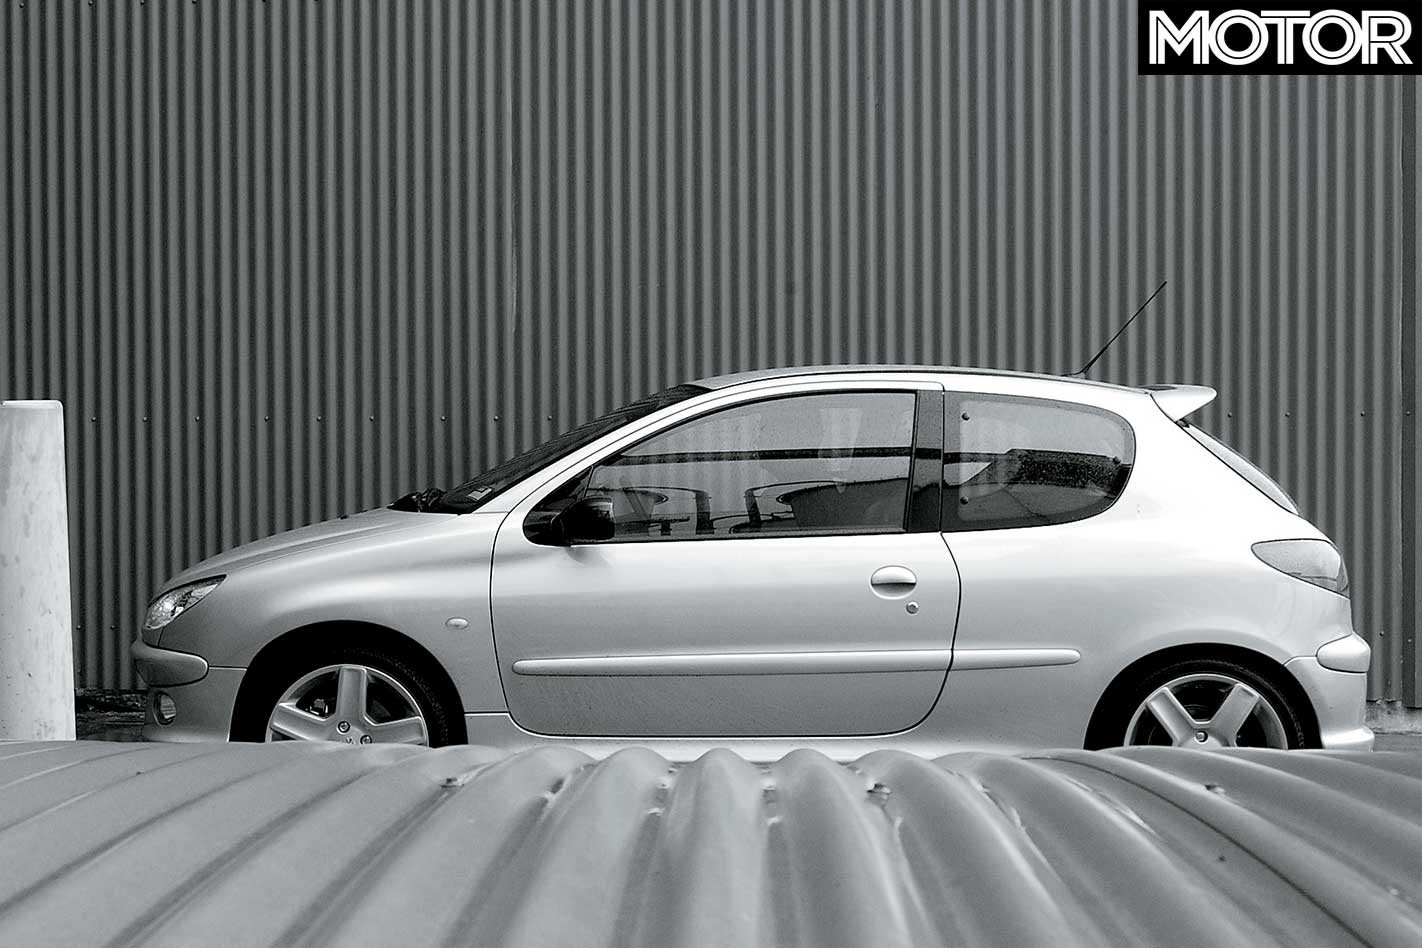 2004 Holden Astra Sri Turbo Vs Peugeot 206 Gti 180 Comparison Review Classic Motor